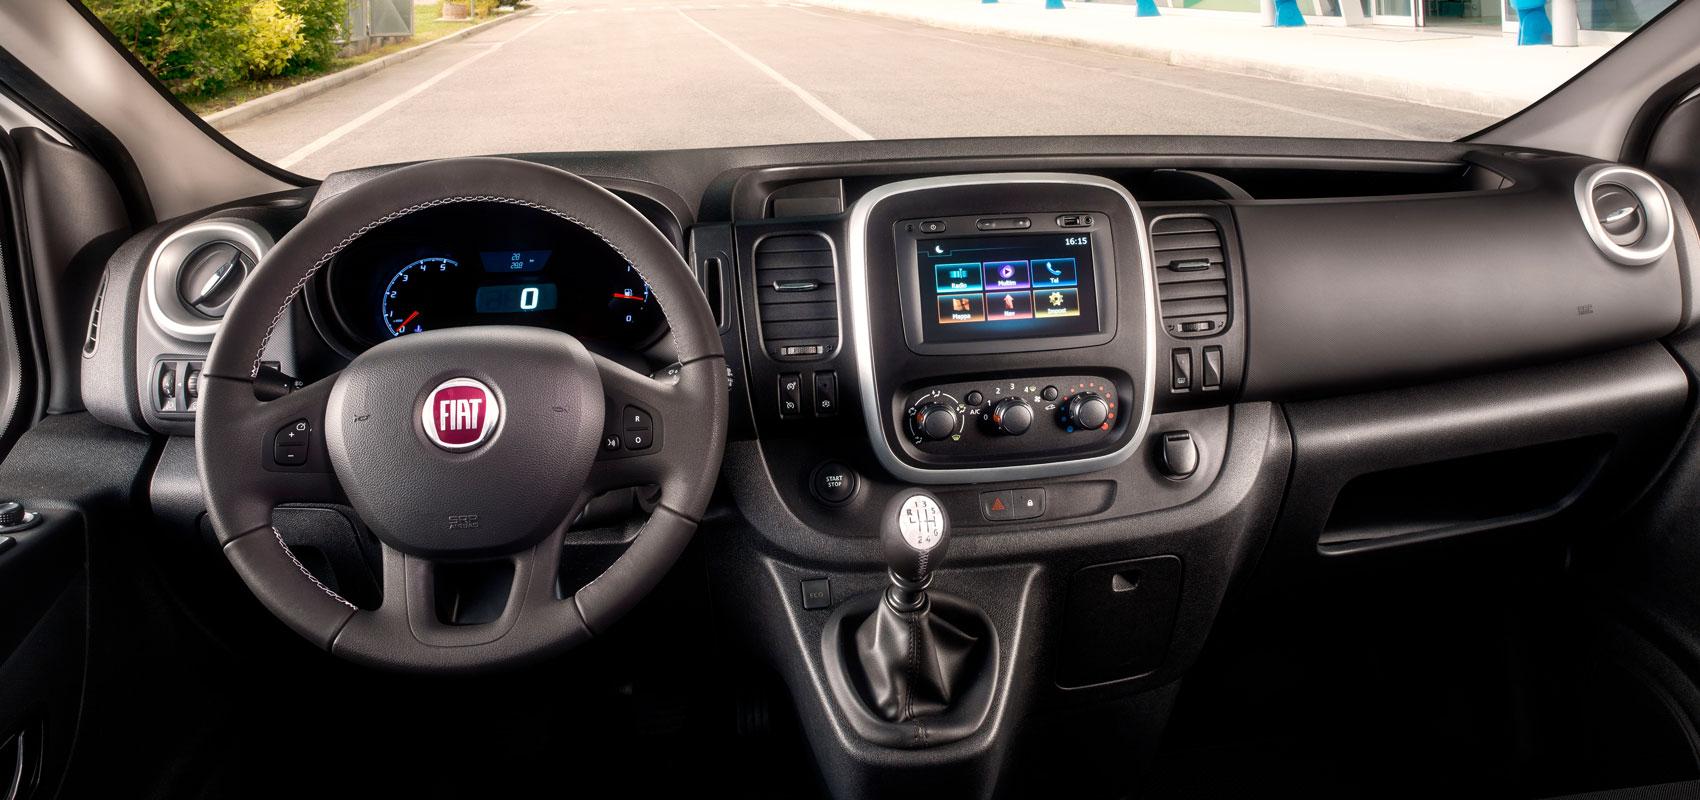 Fiat Talento Cockpit